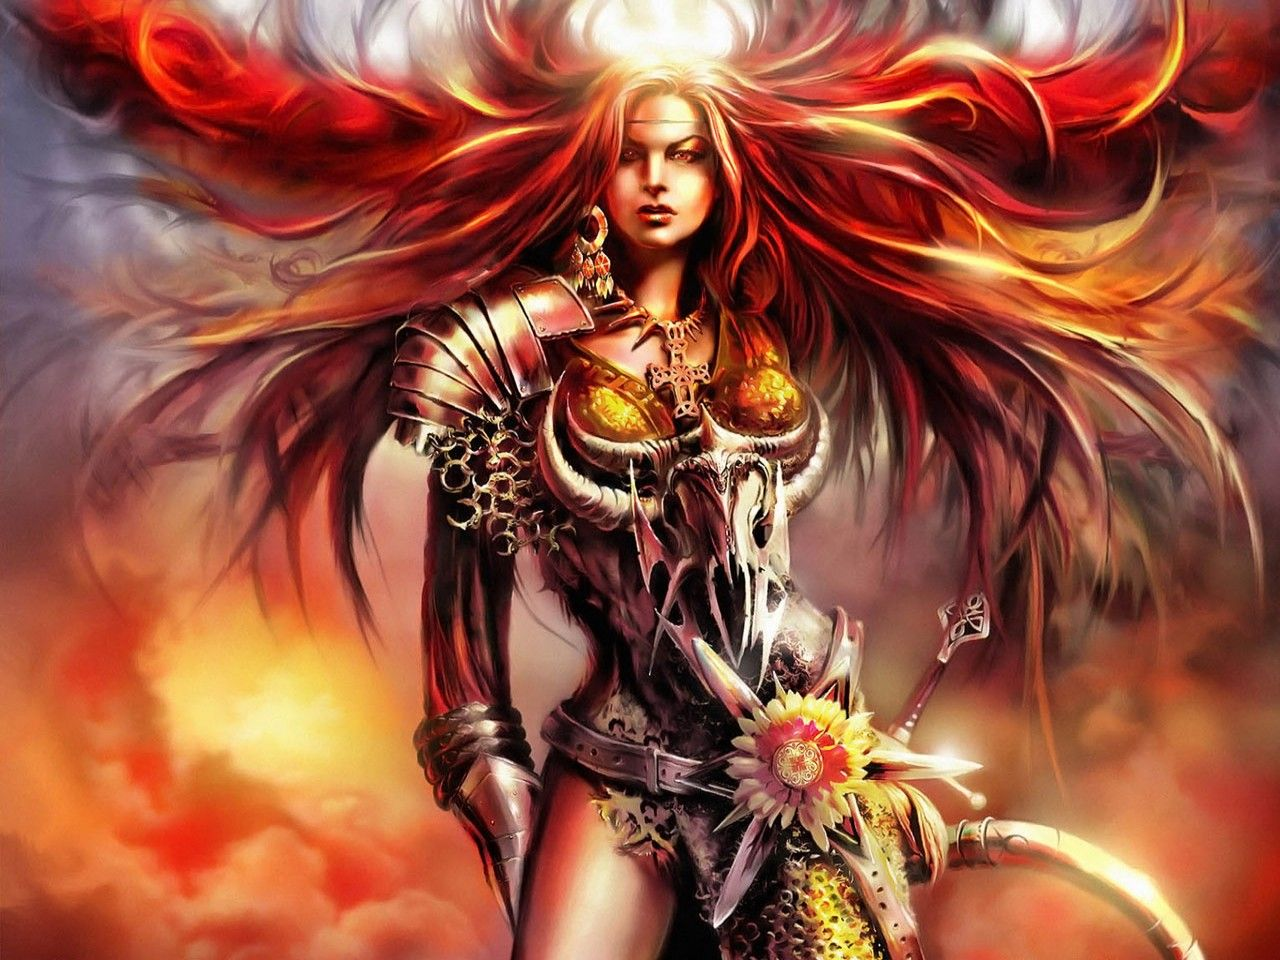 Bolet Wallpapers fantasy women art wallpapers 1280x960